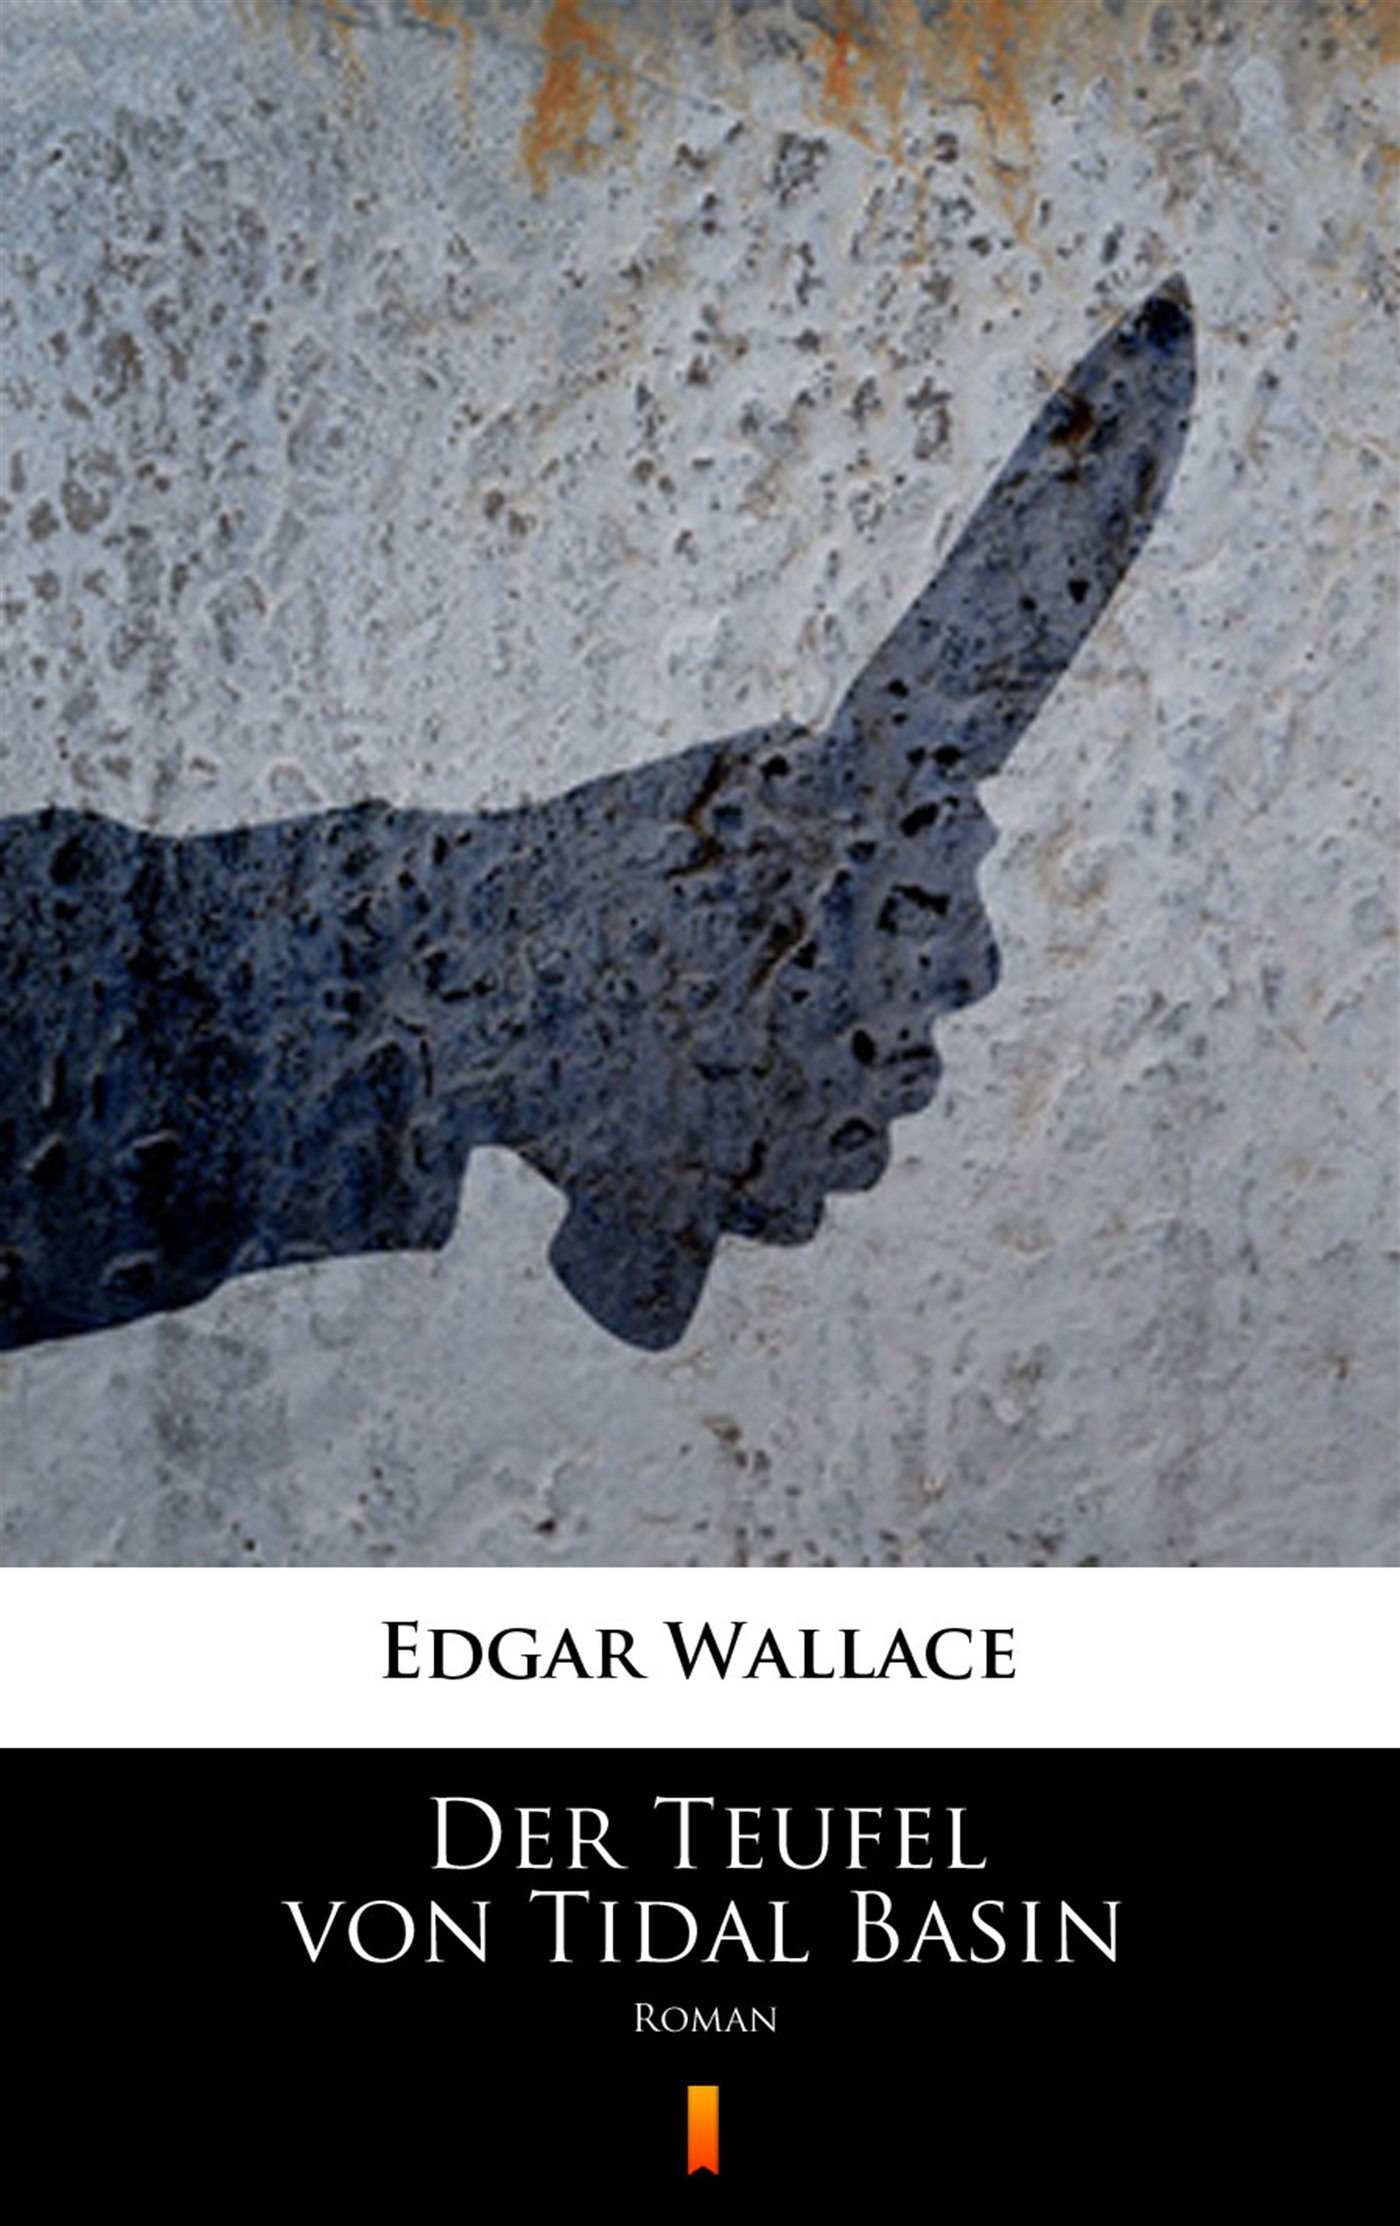 Der Teufel von Tidal Basin - Ebook (Książka na Kindle) do pobrania w formacie MOBI